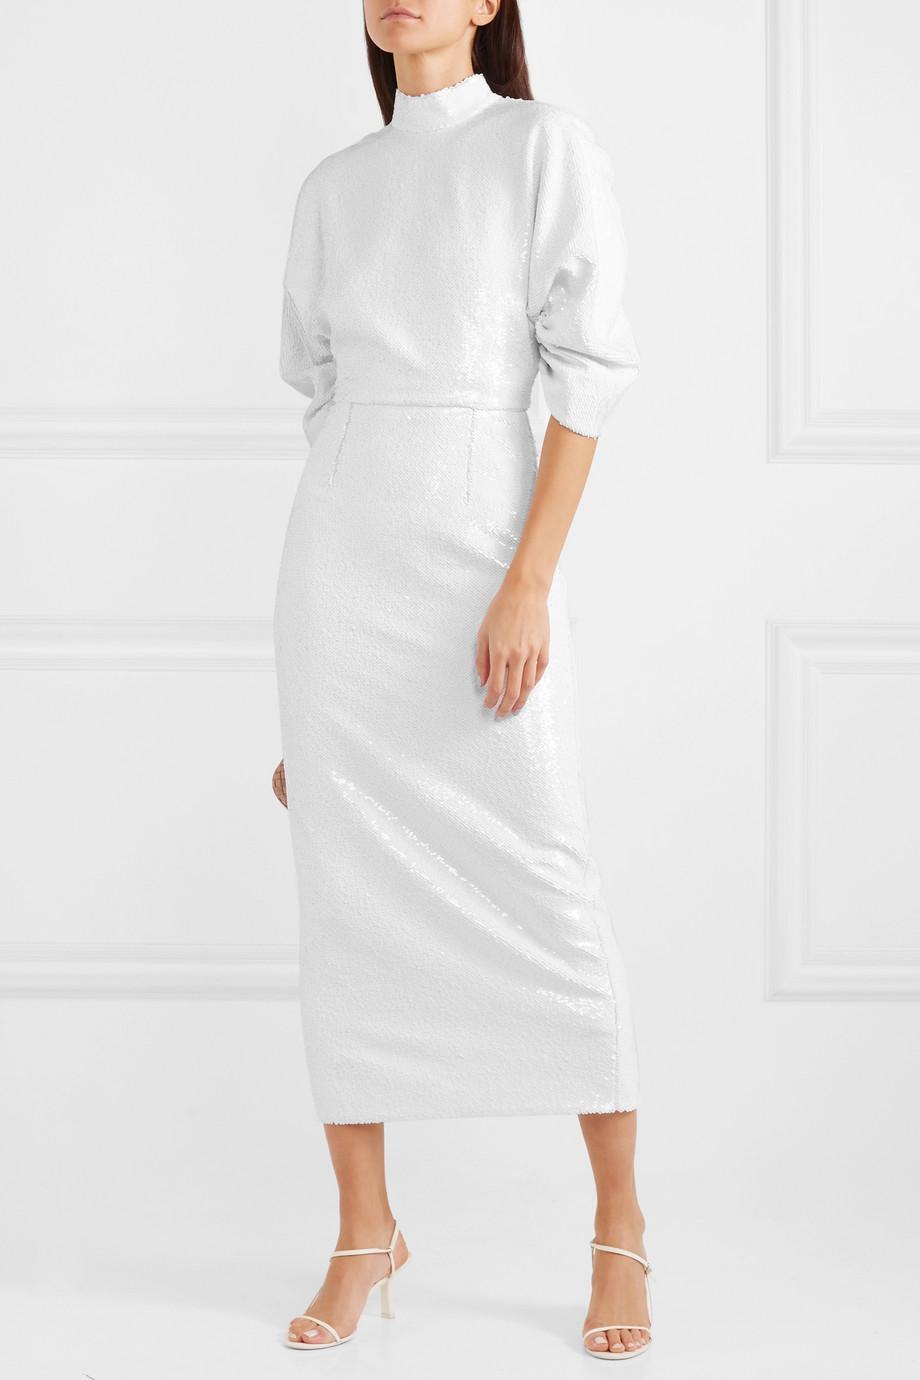 Emilia Wickstead Shari open-back sequined chiffon midi dress